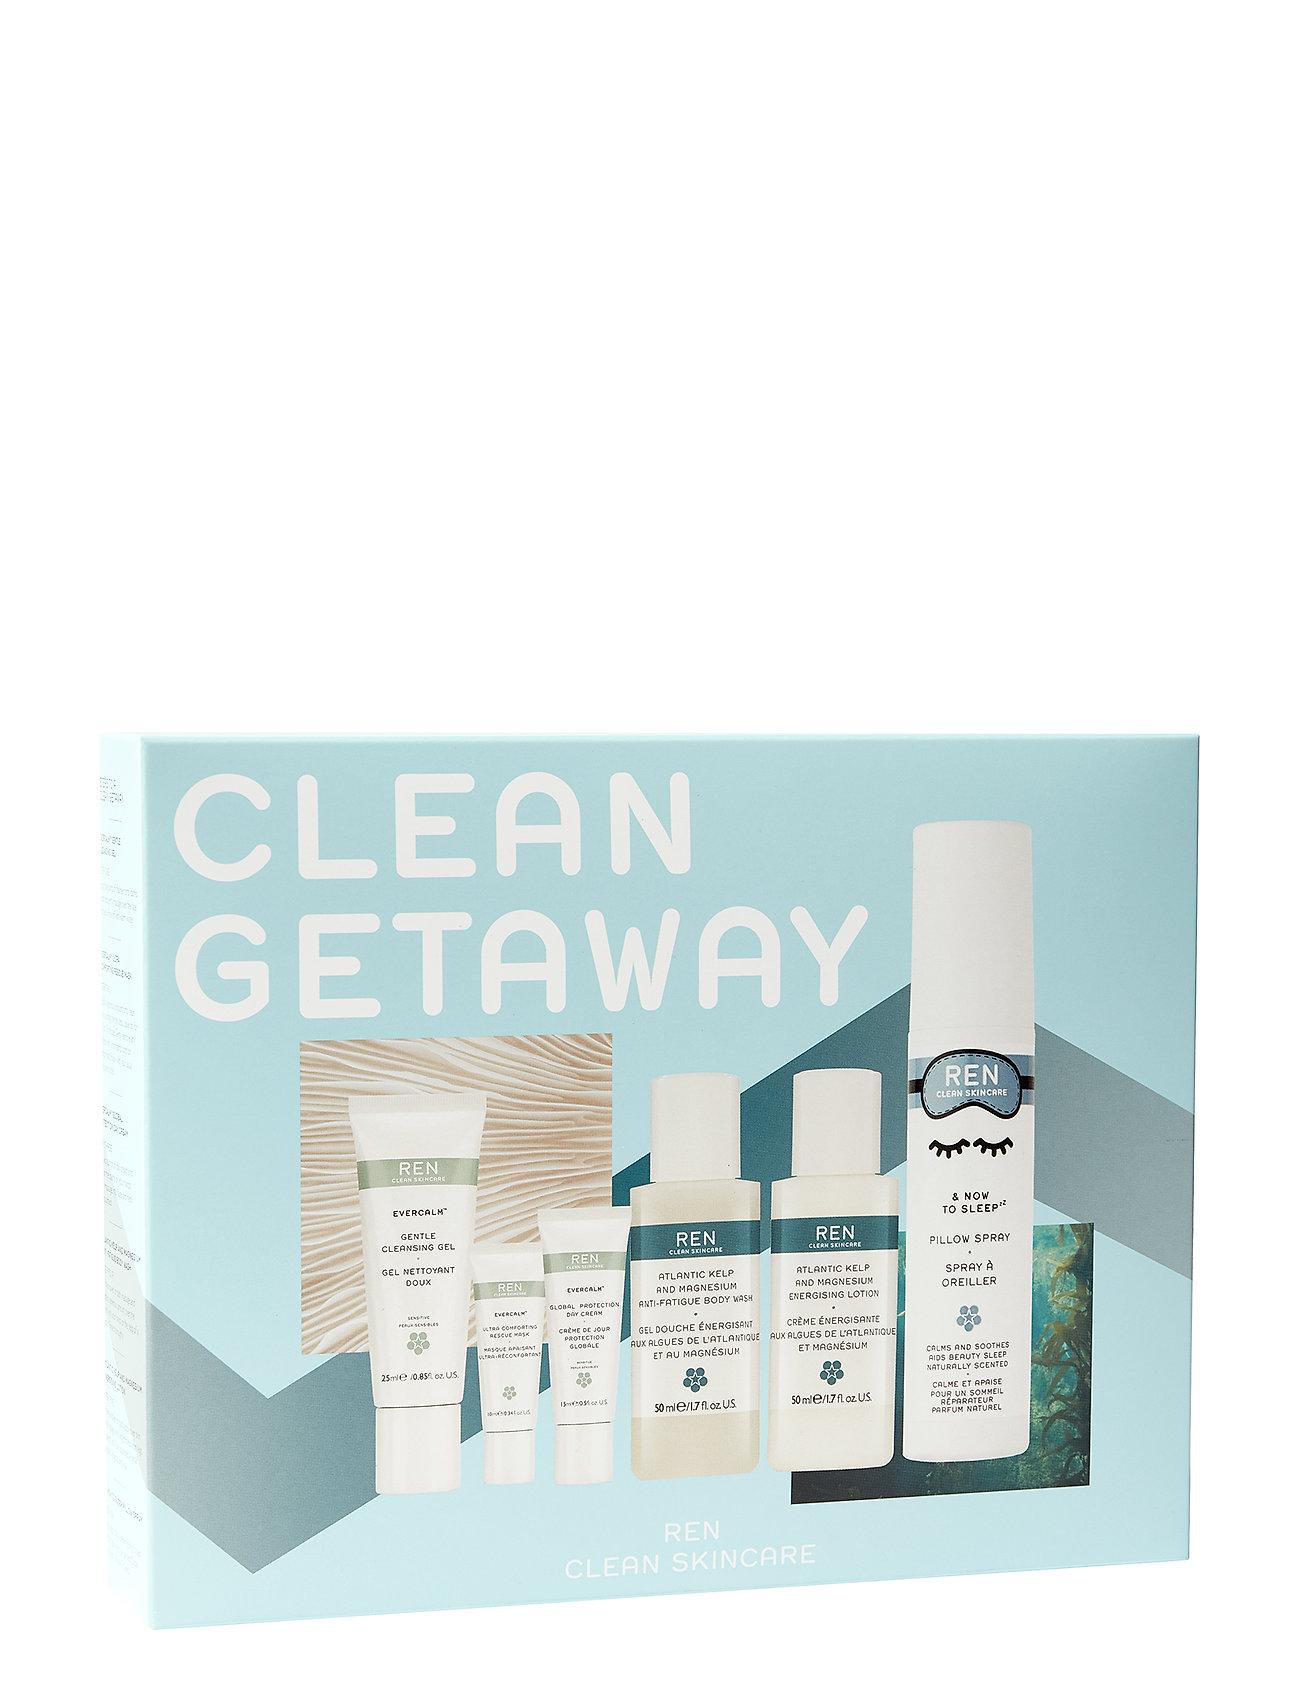 REN Clean Getaway Experience Kit - CLEAR